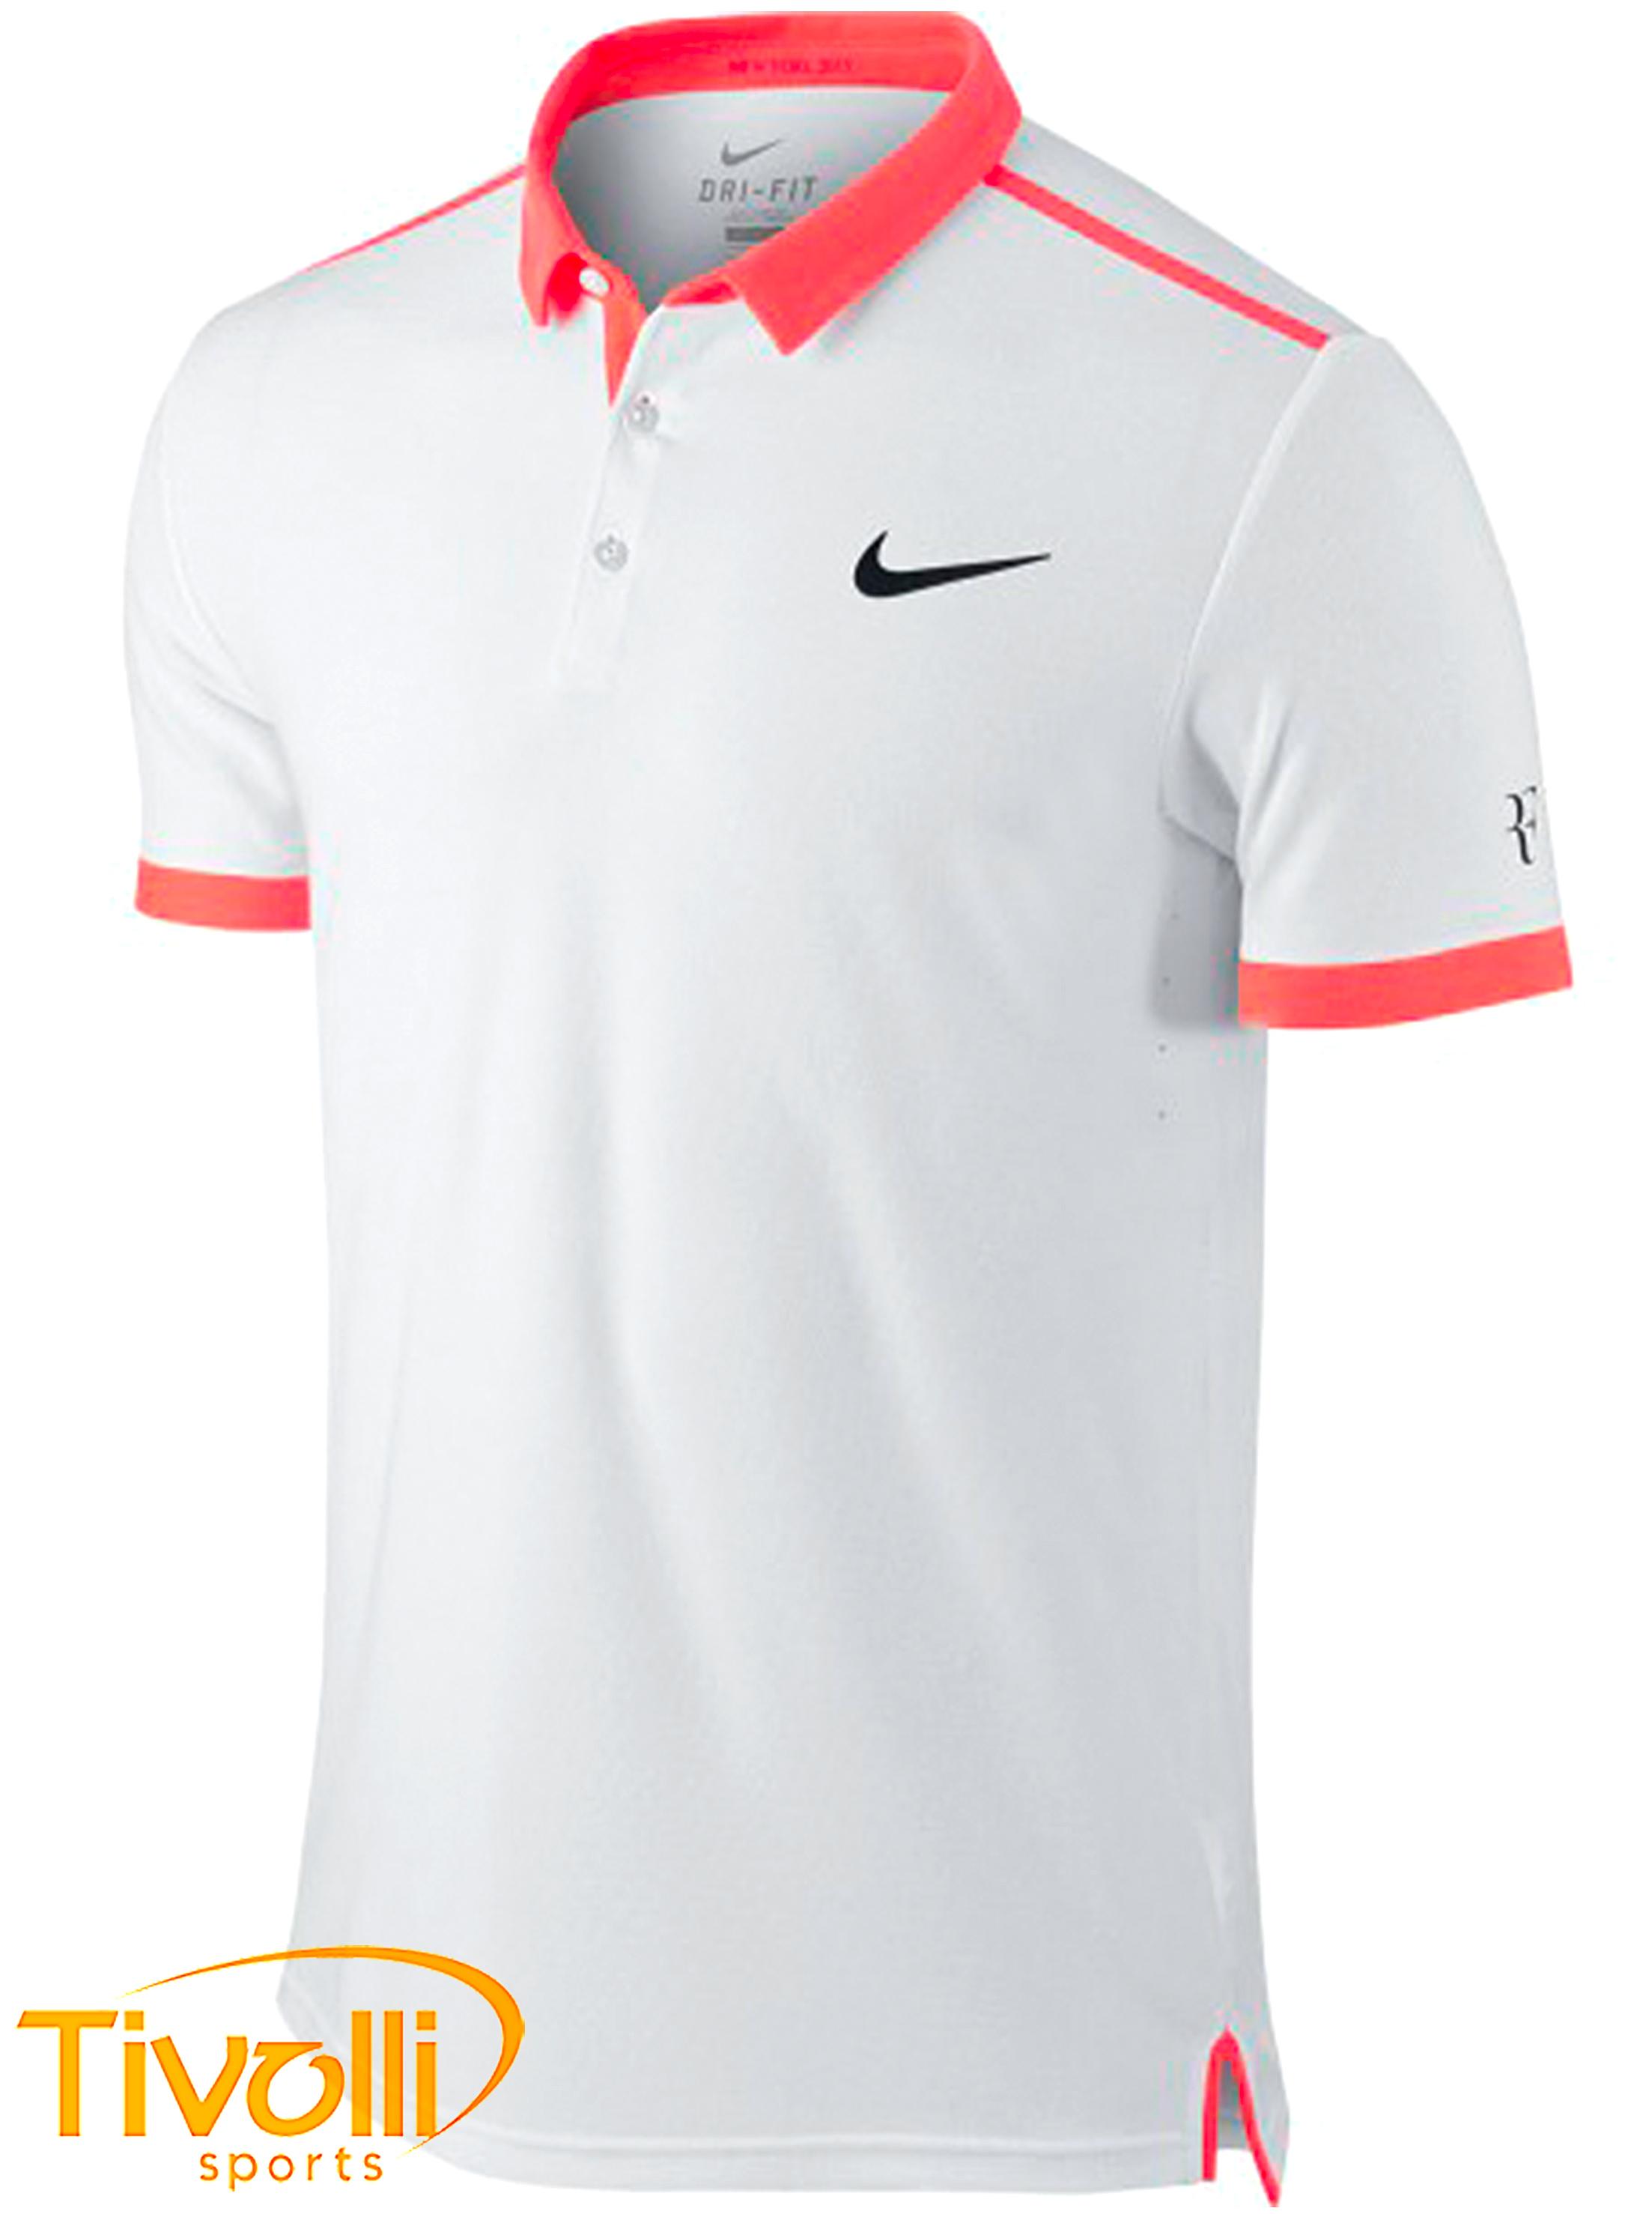 d7b12151ade Camisa Polo Nike Court Advantage Premier RF Branco e Salmão - Roger Federer  - US Open 2015